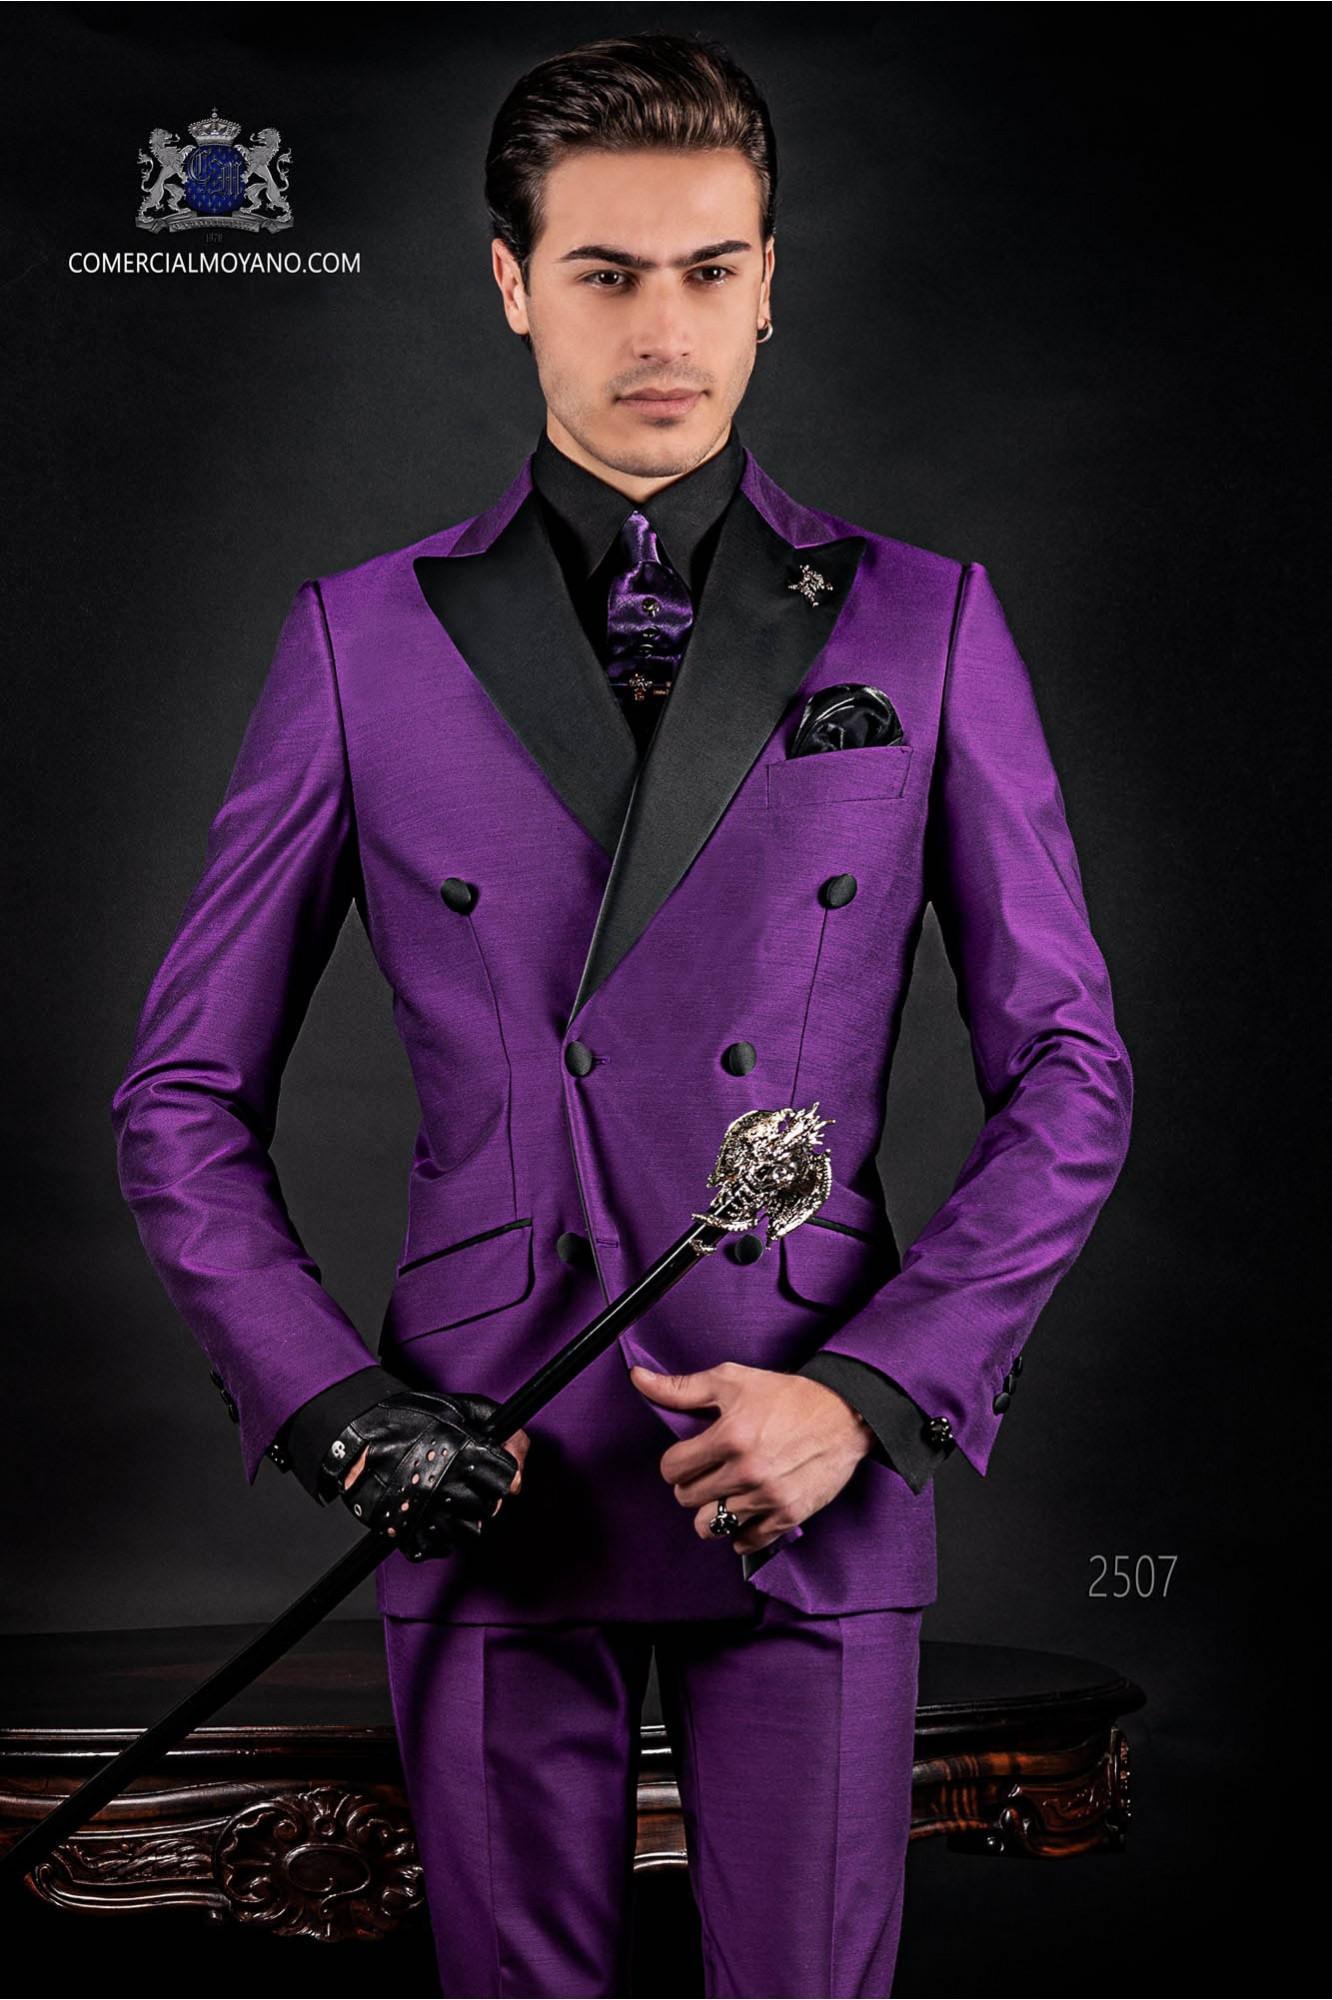 Traje de moda italiano a medida cruzado morado